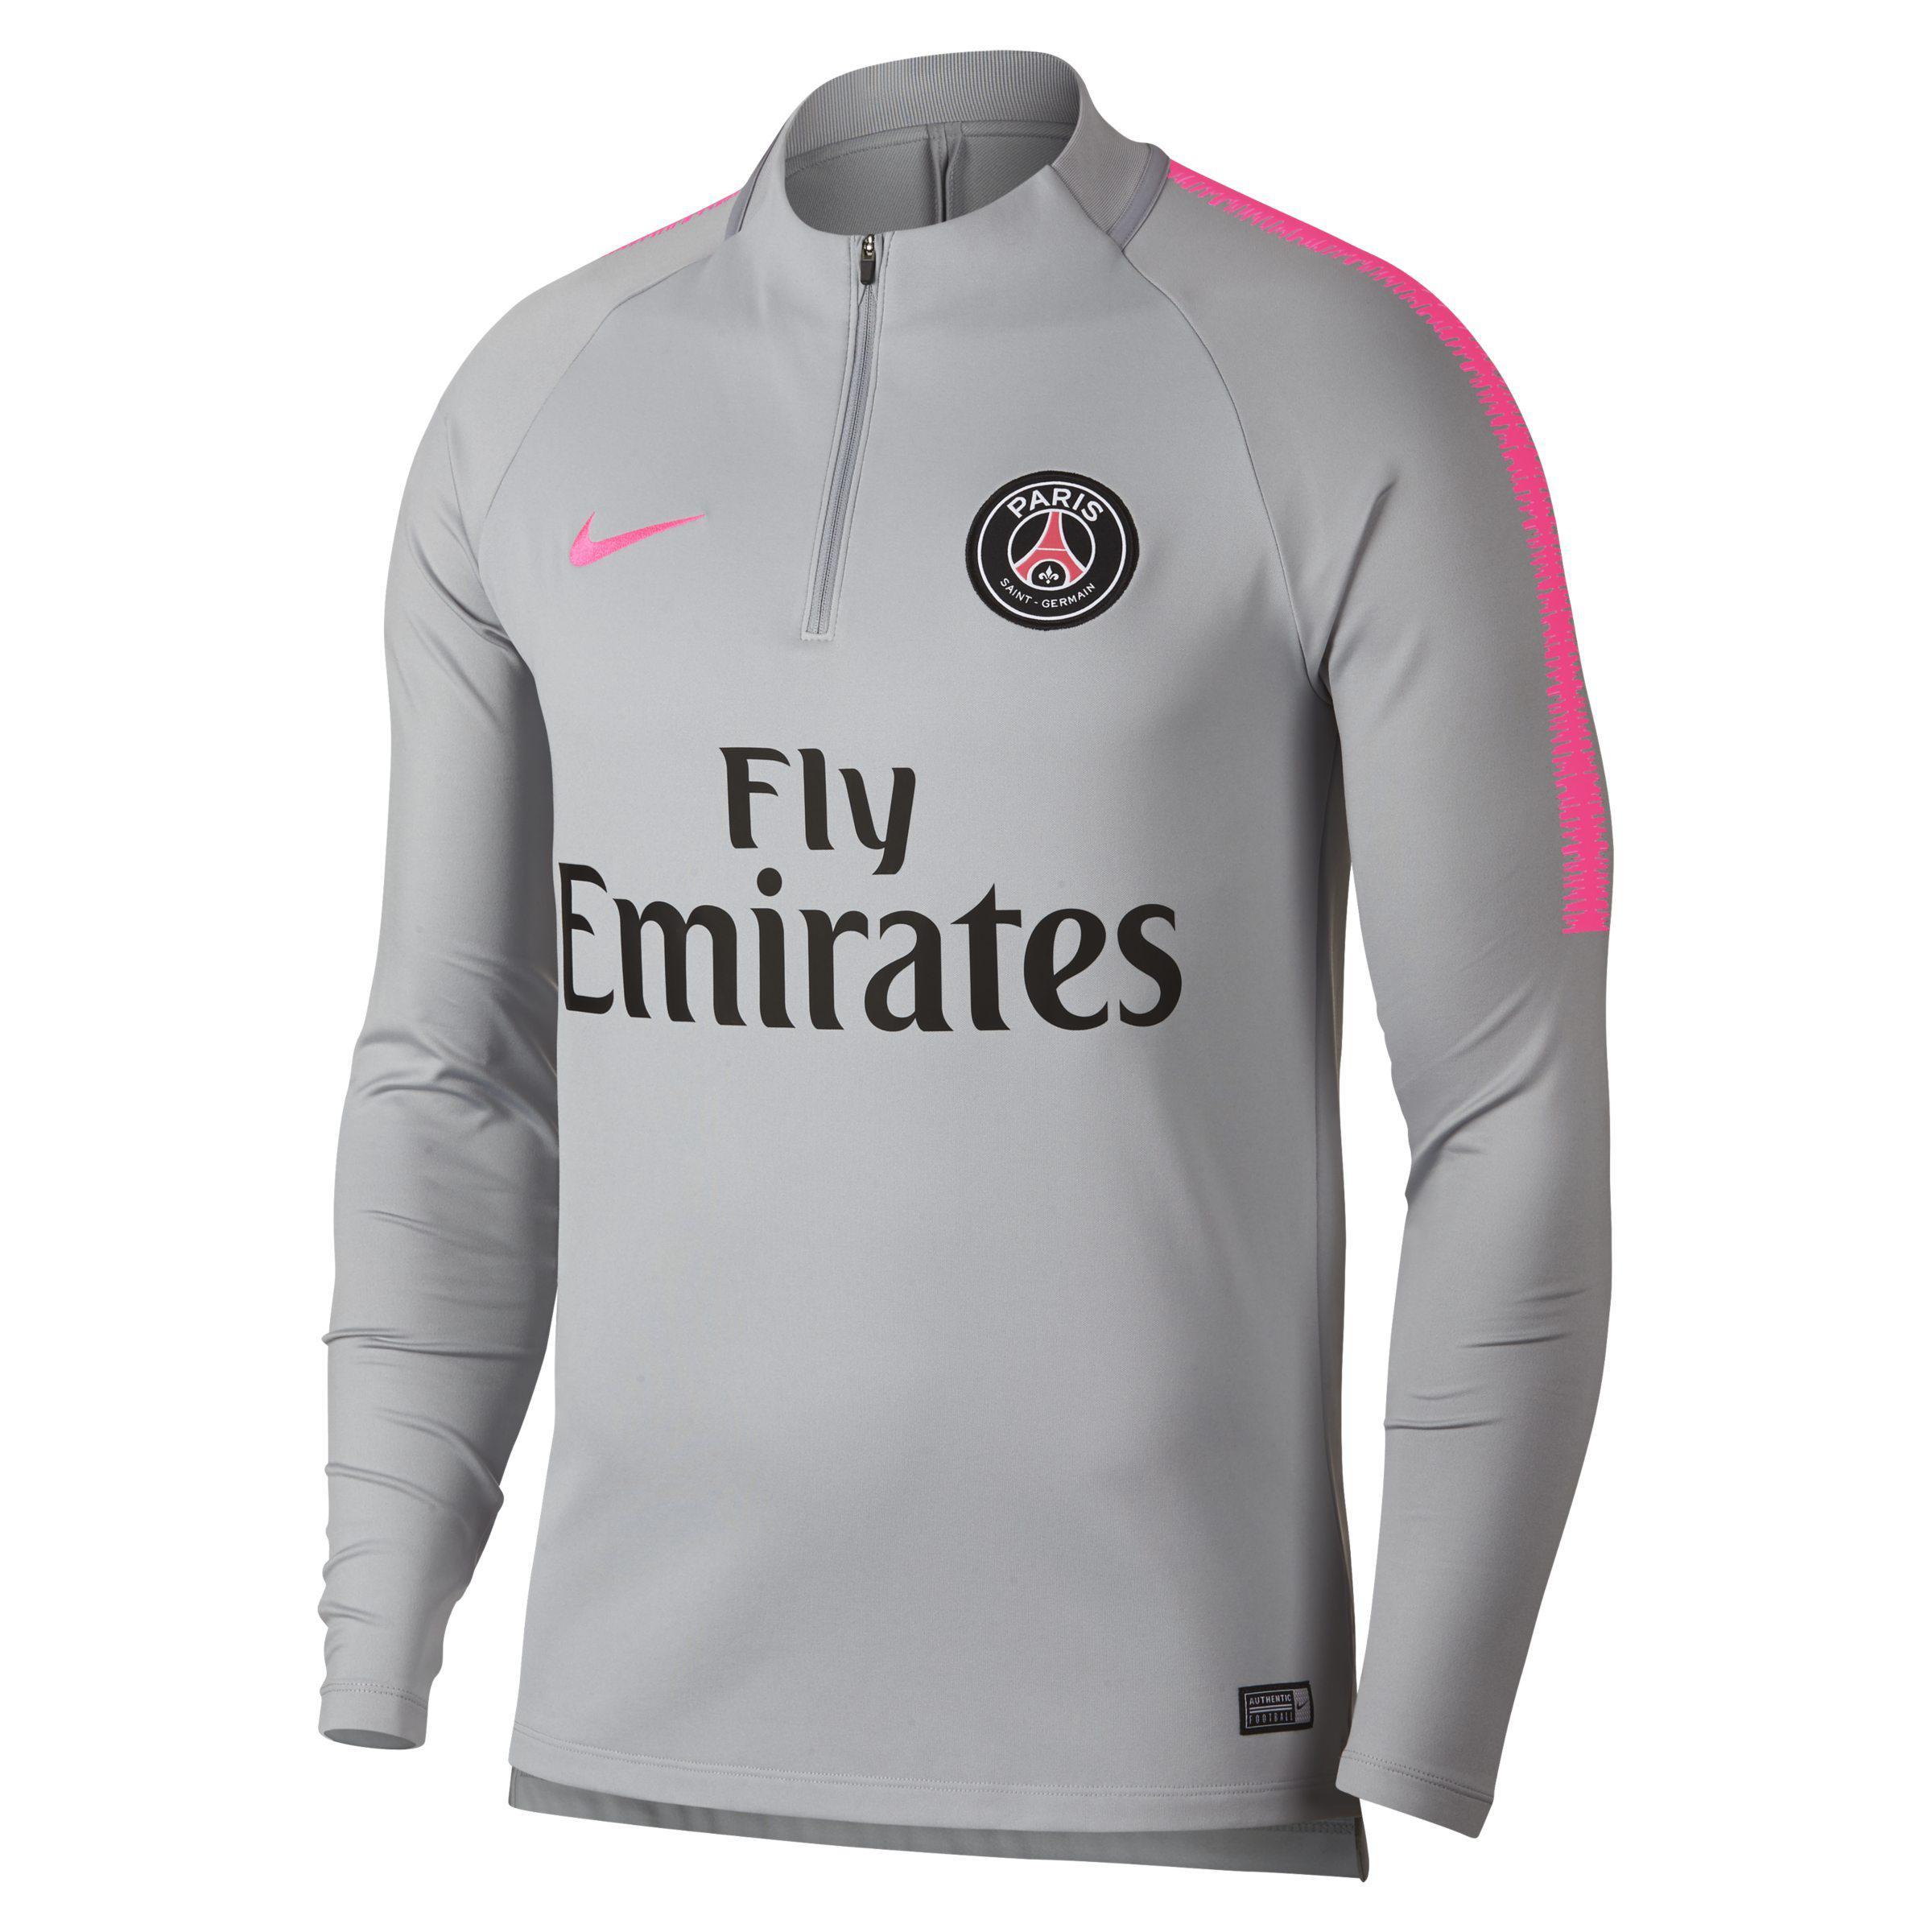 323d4e4d8 Nike Paris Saintgermain Drifit Squad Drill Men s Sweatshirt In Grey ...